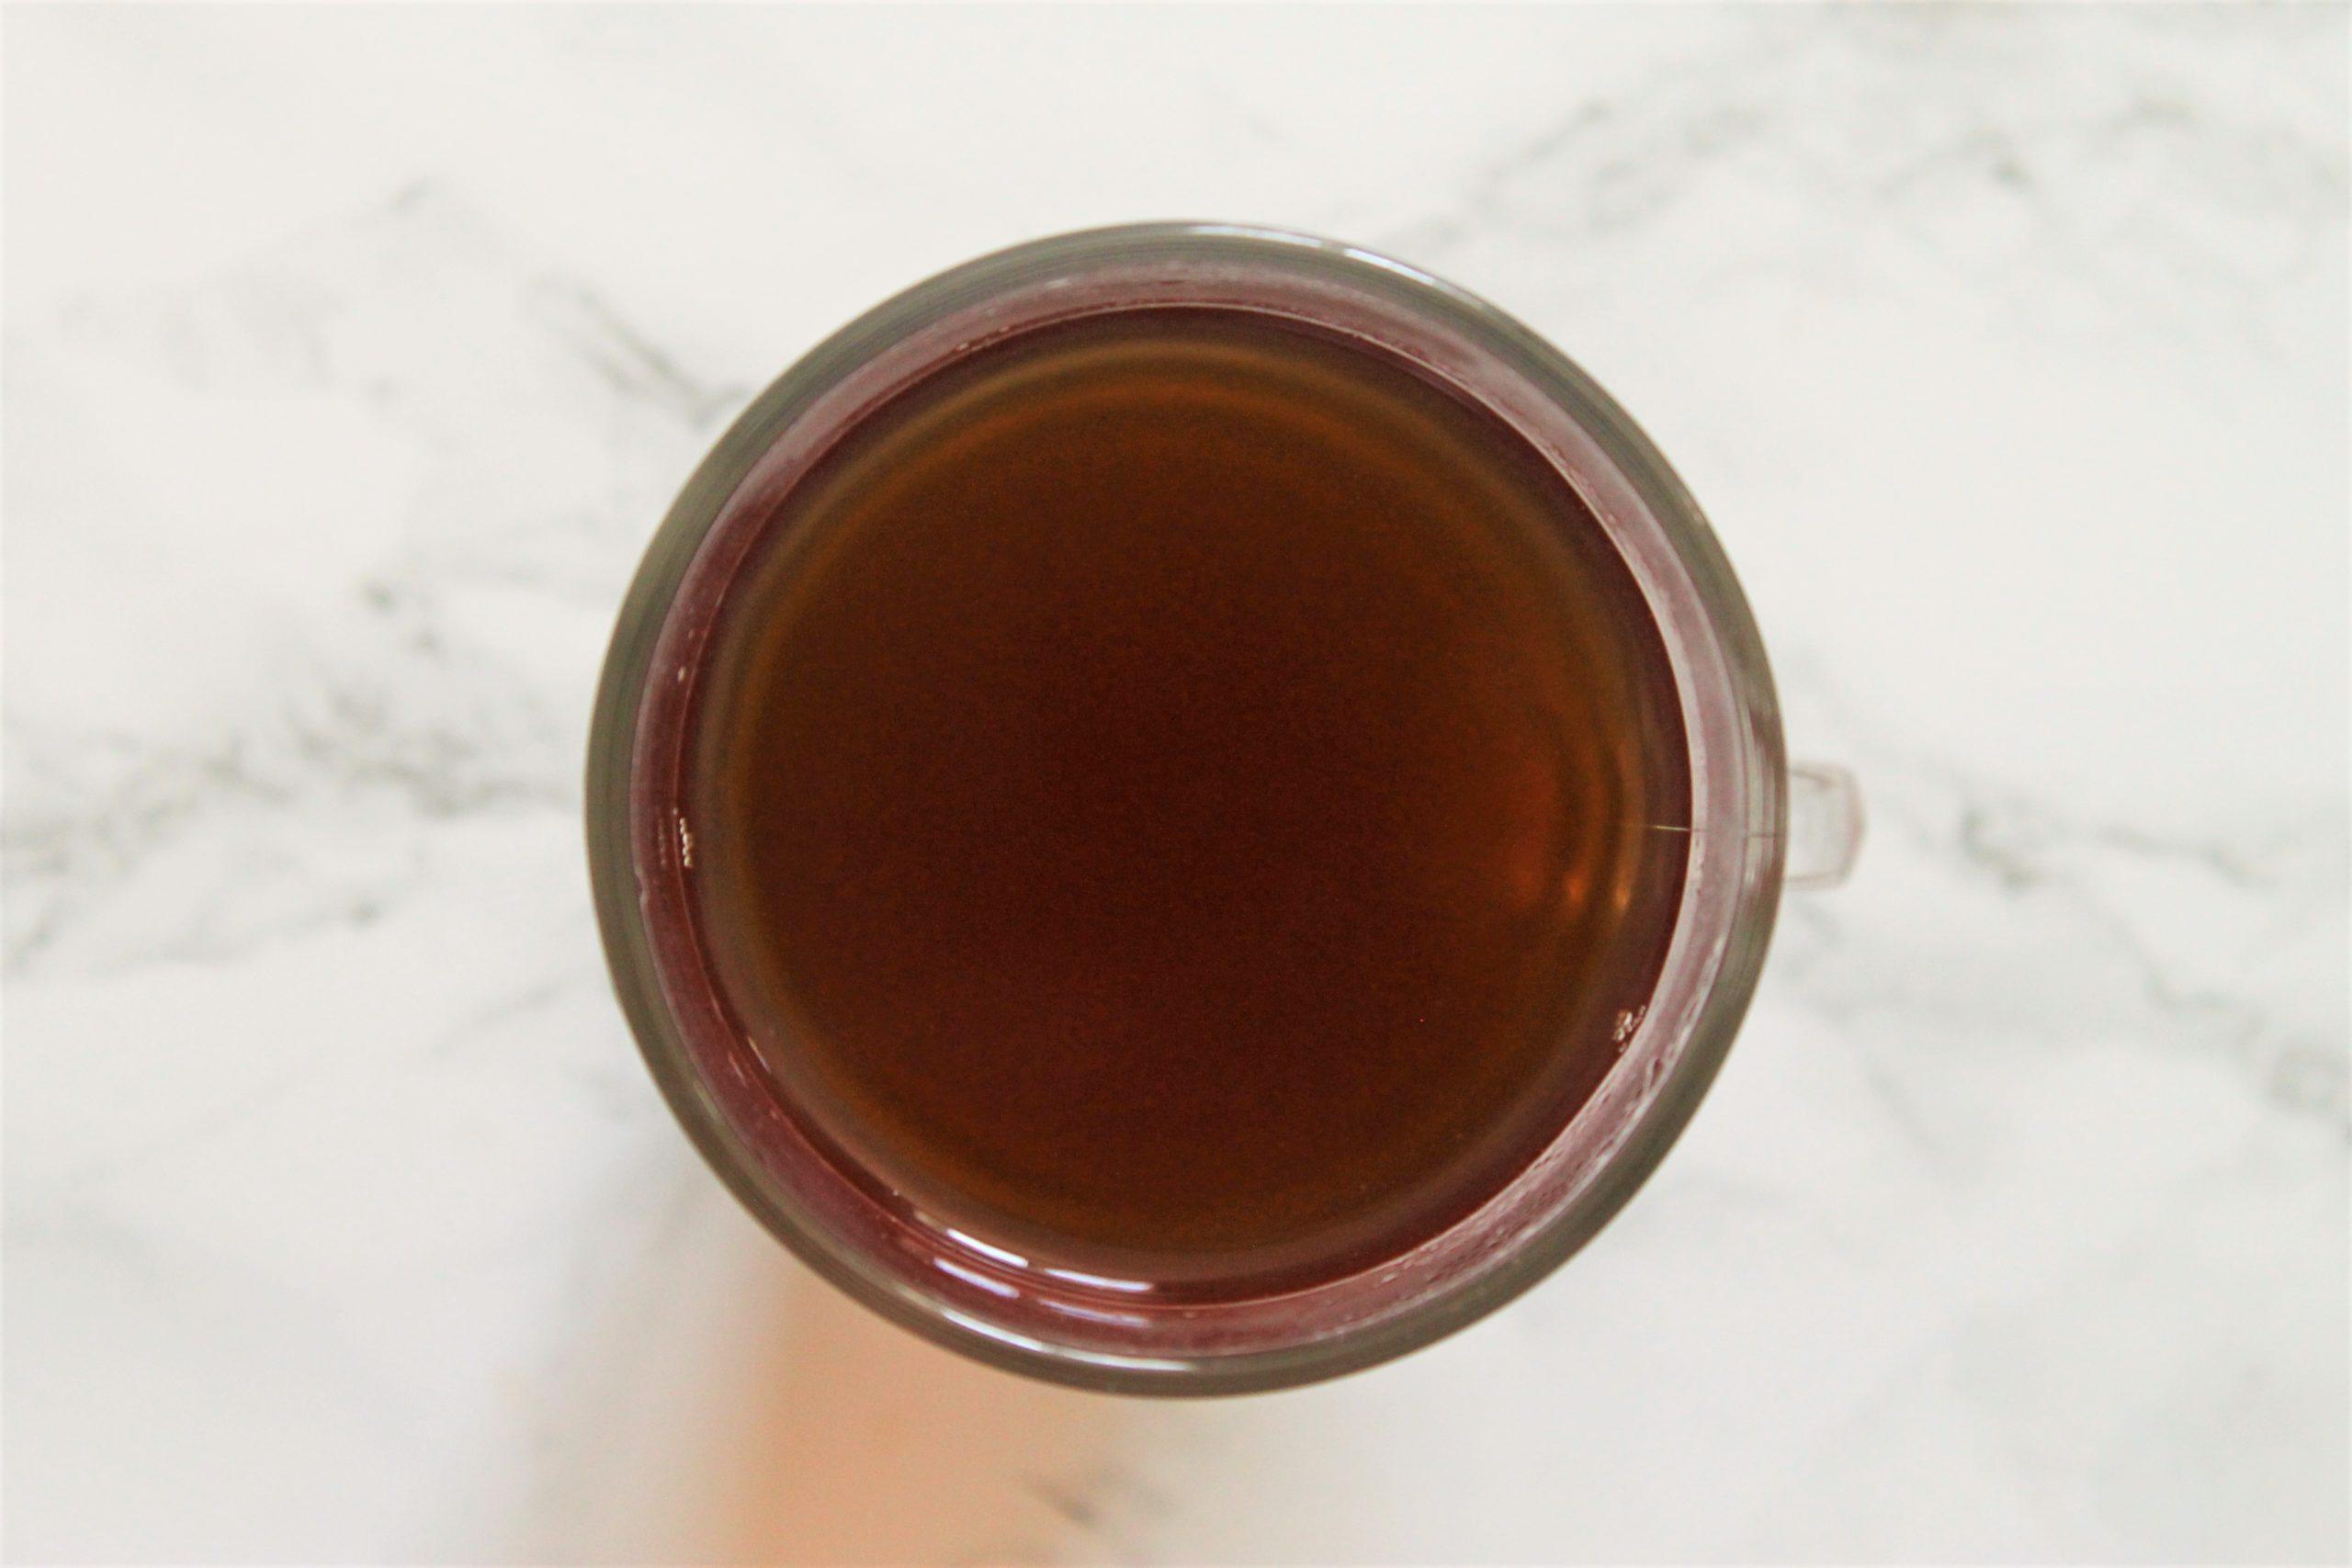 chocolate brown tea